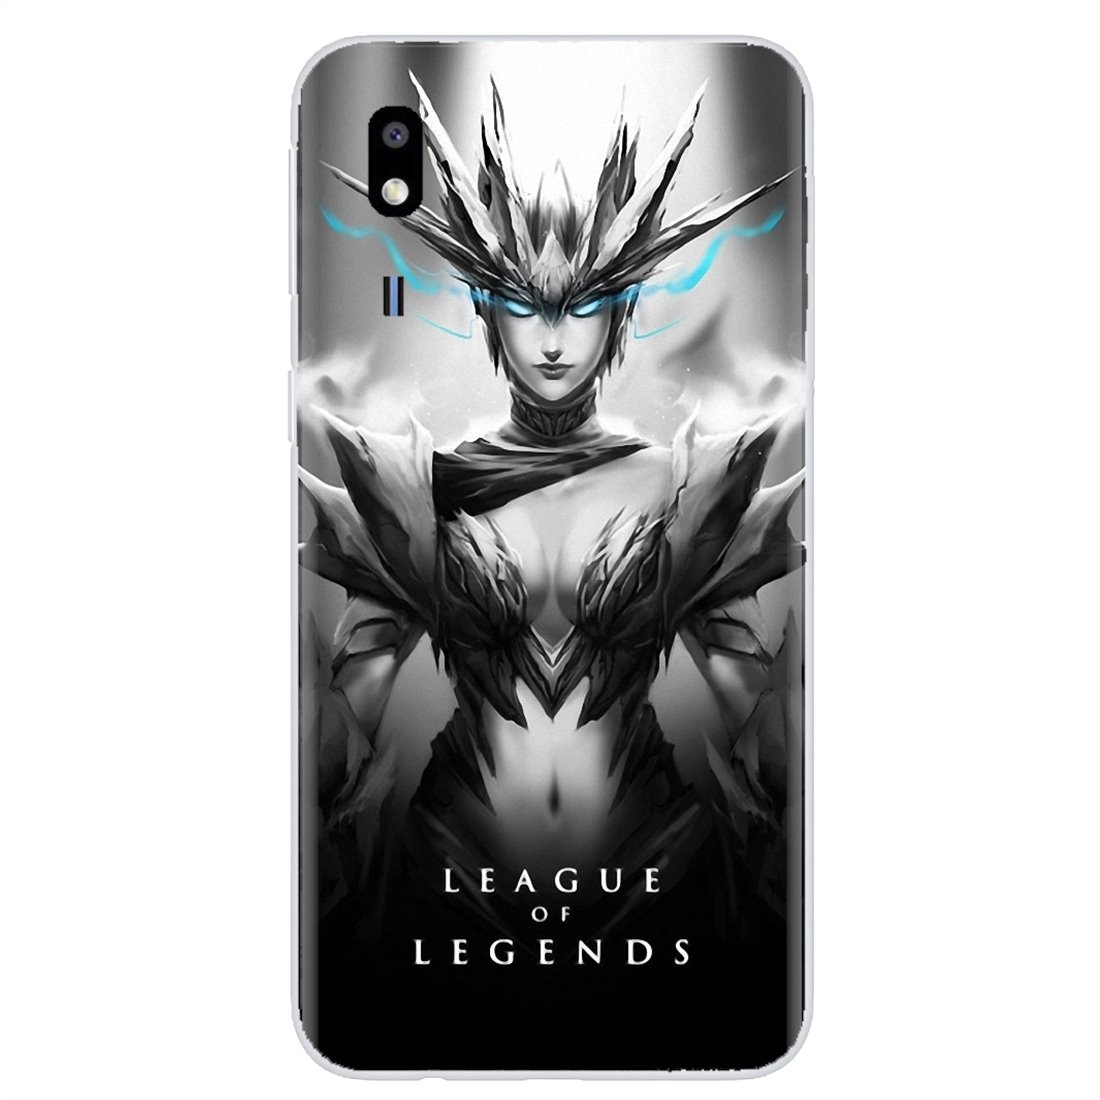 Para Xiaomi Redmi 4A 7A S2 Nota 8 3S 3S 4 4X4 5X5 6 Plus 7 6A Pro teléfono móvil F1 Liga de Leyendas lol yasuo venta al por menor de la caja del teléfono de silicona